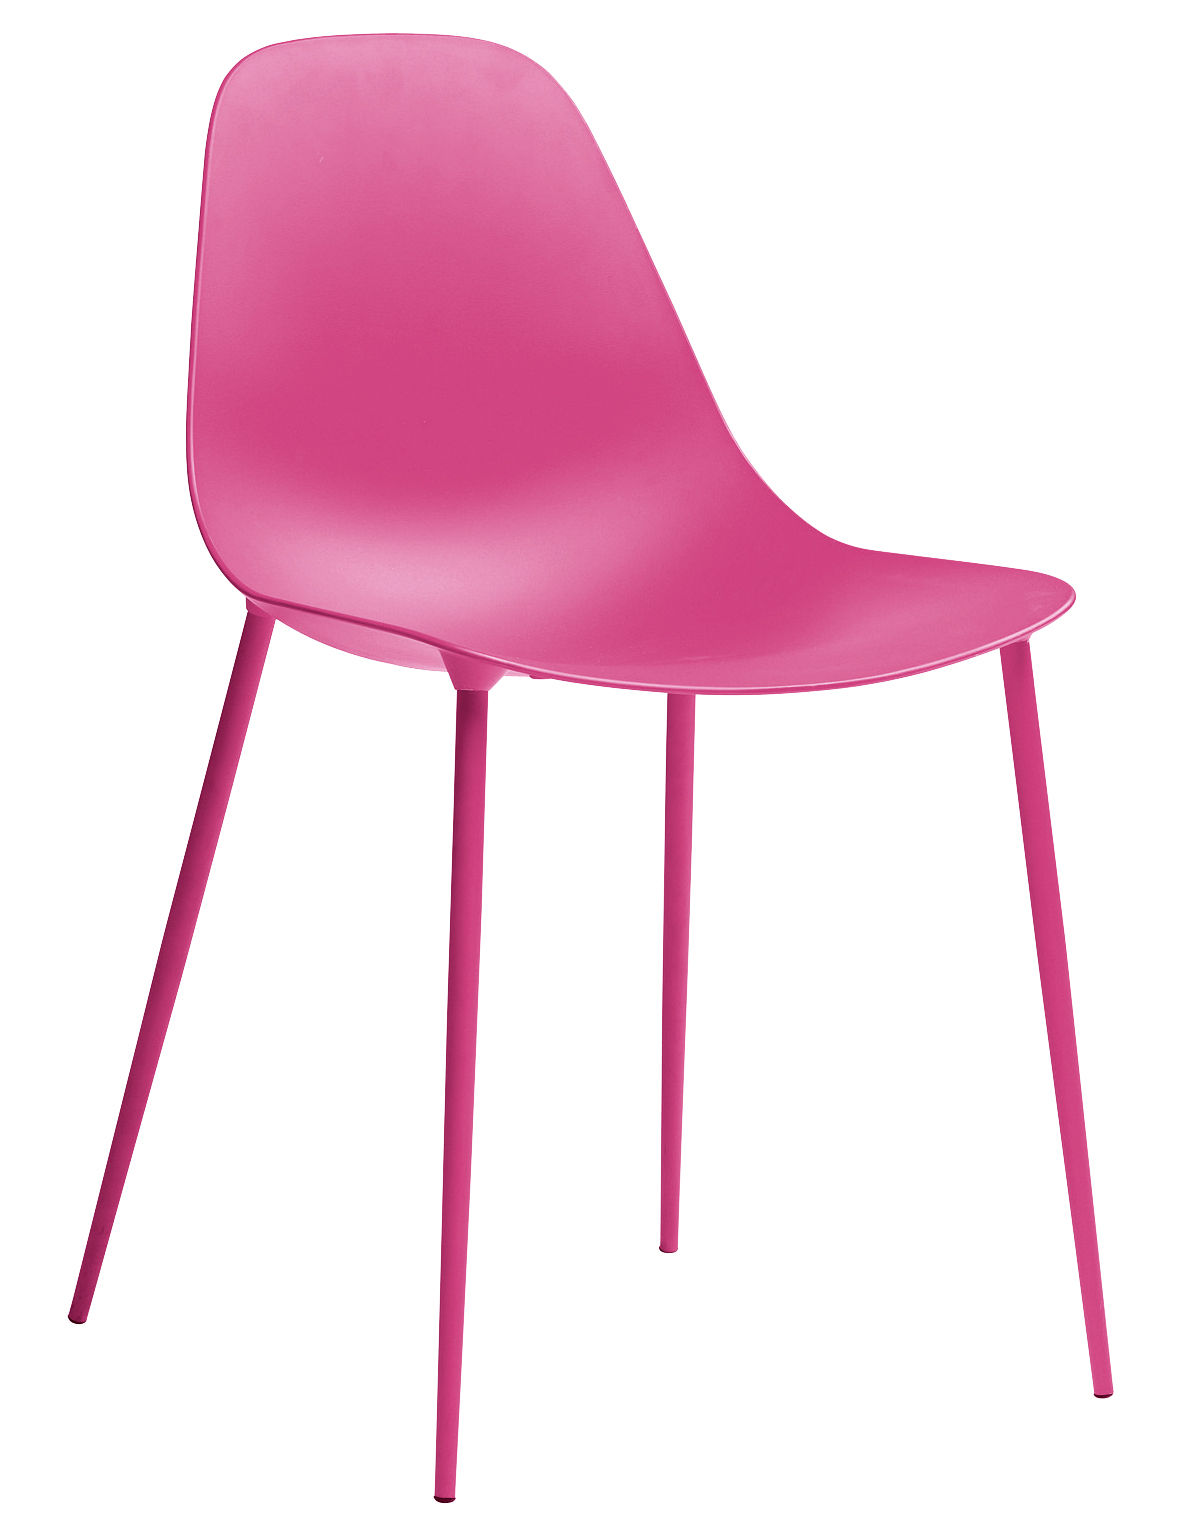 Furniture - Chairs - Mammamia Chair - Metal shell & legs by Opinion Ciatti - Pink - Aluminium, Metal